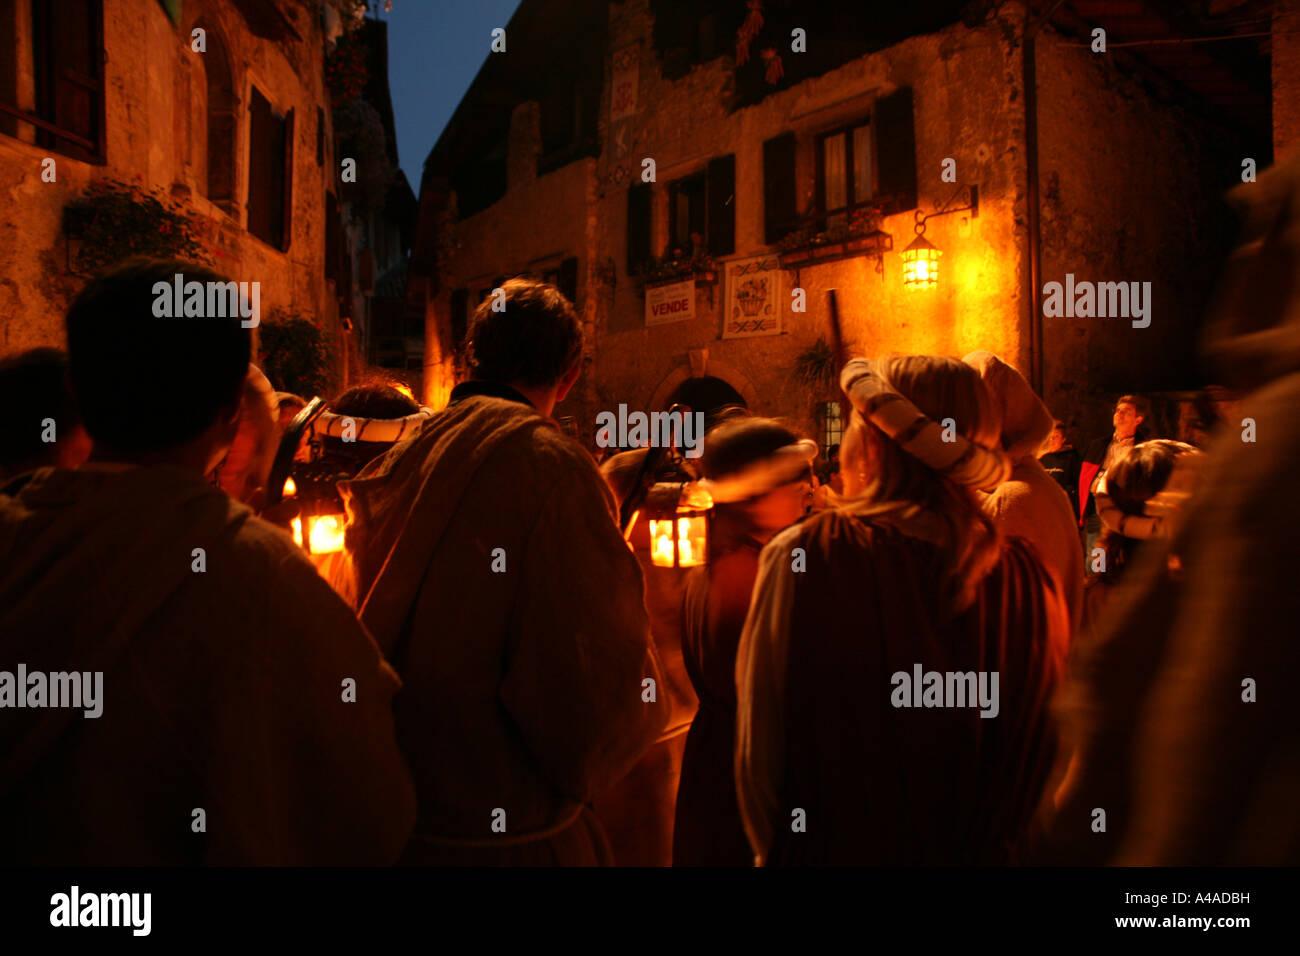 Historic recalling during Rustico Medioevo manifestation Canale di Tenno Trentino Alto Adige Italy - Stock Image